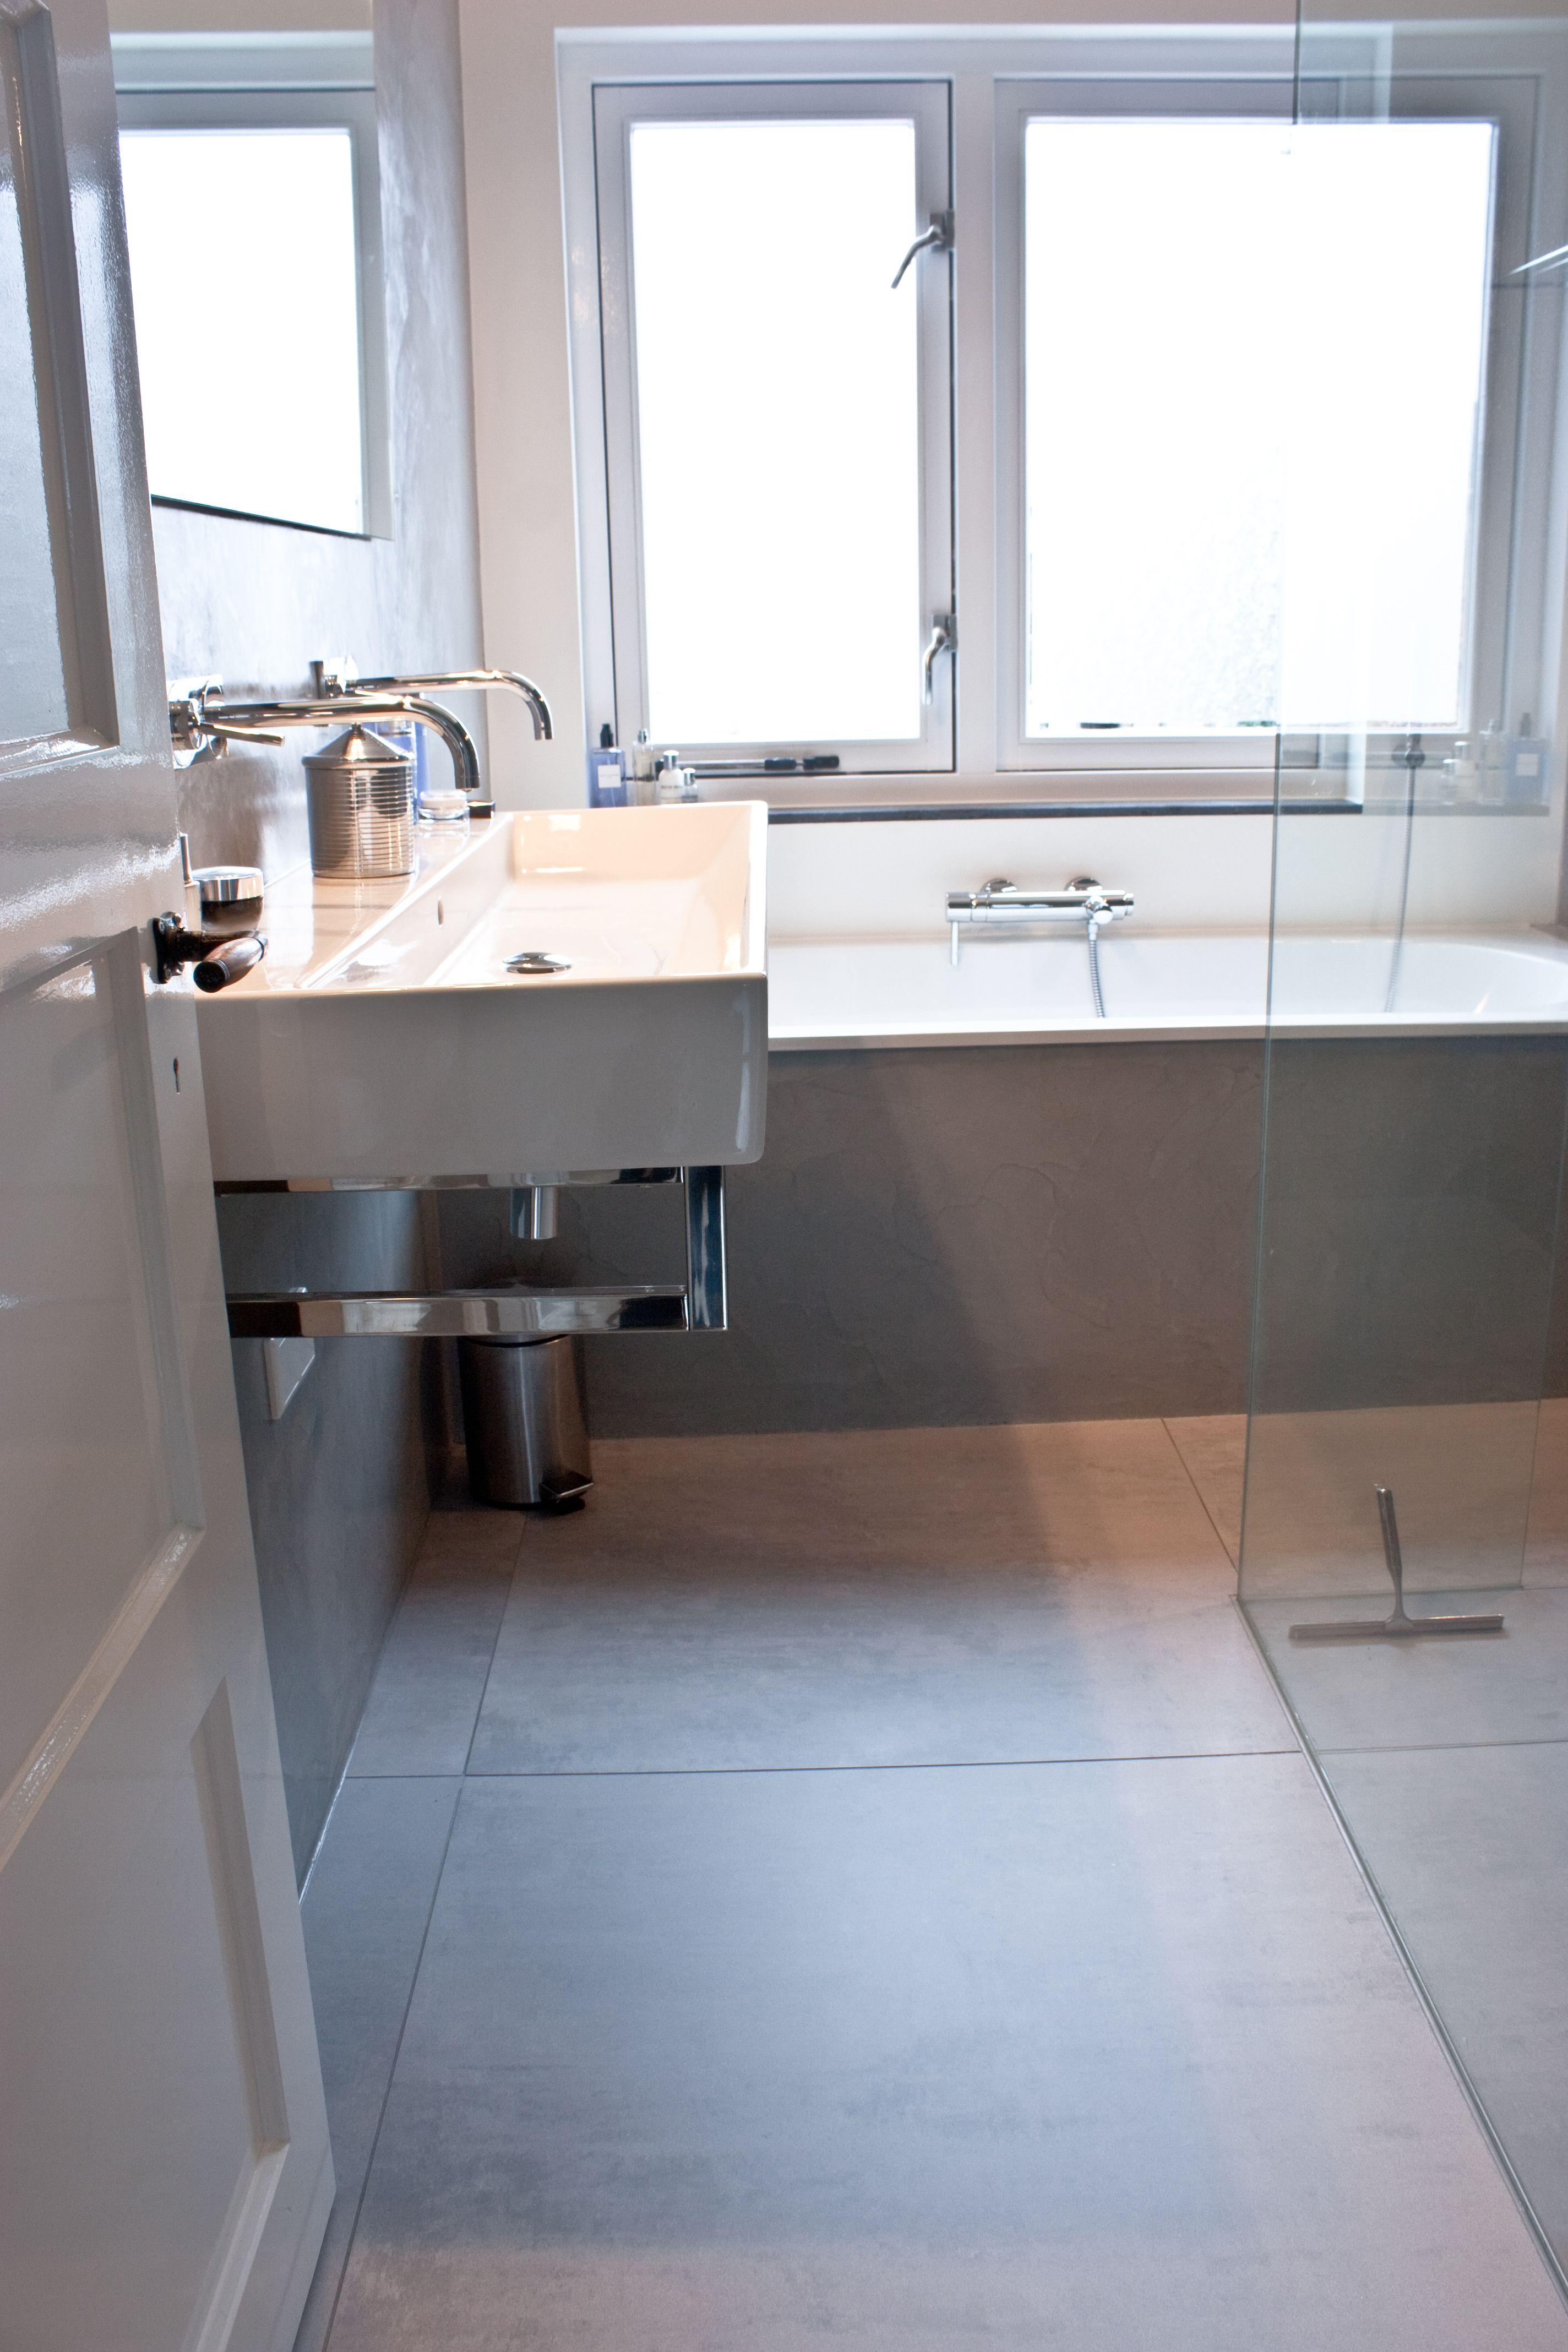 Mosa 90 x 90 cm licht grijs 206V via MoreFloors in badkamer ...